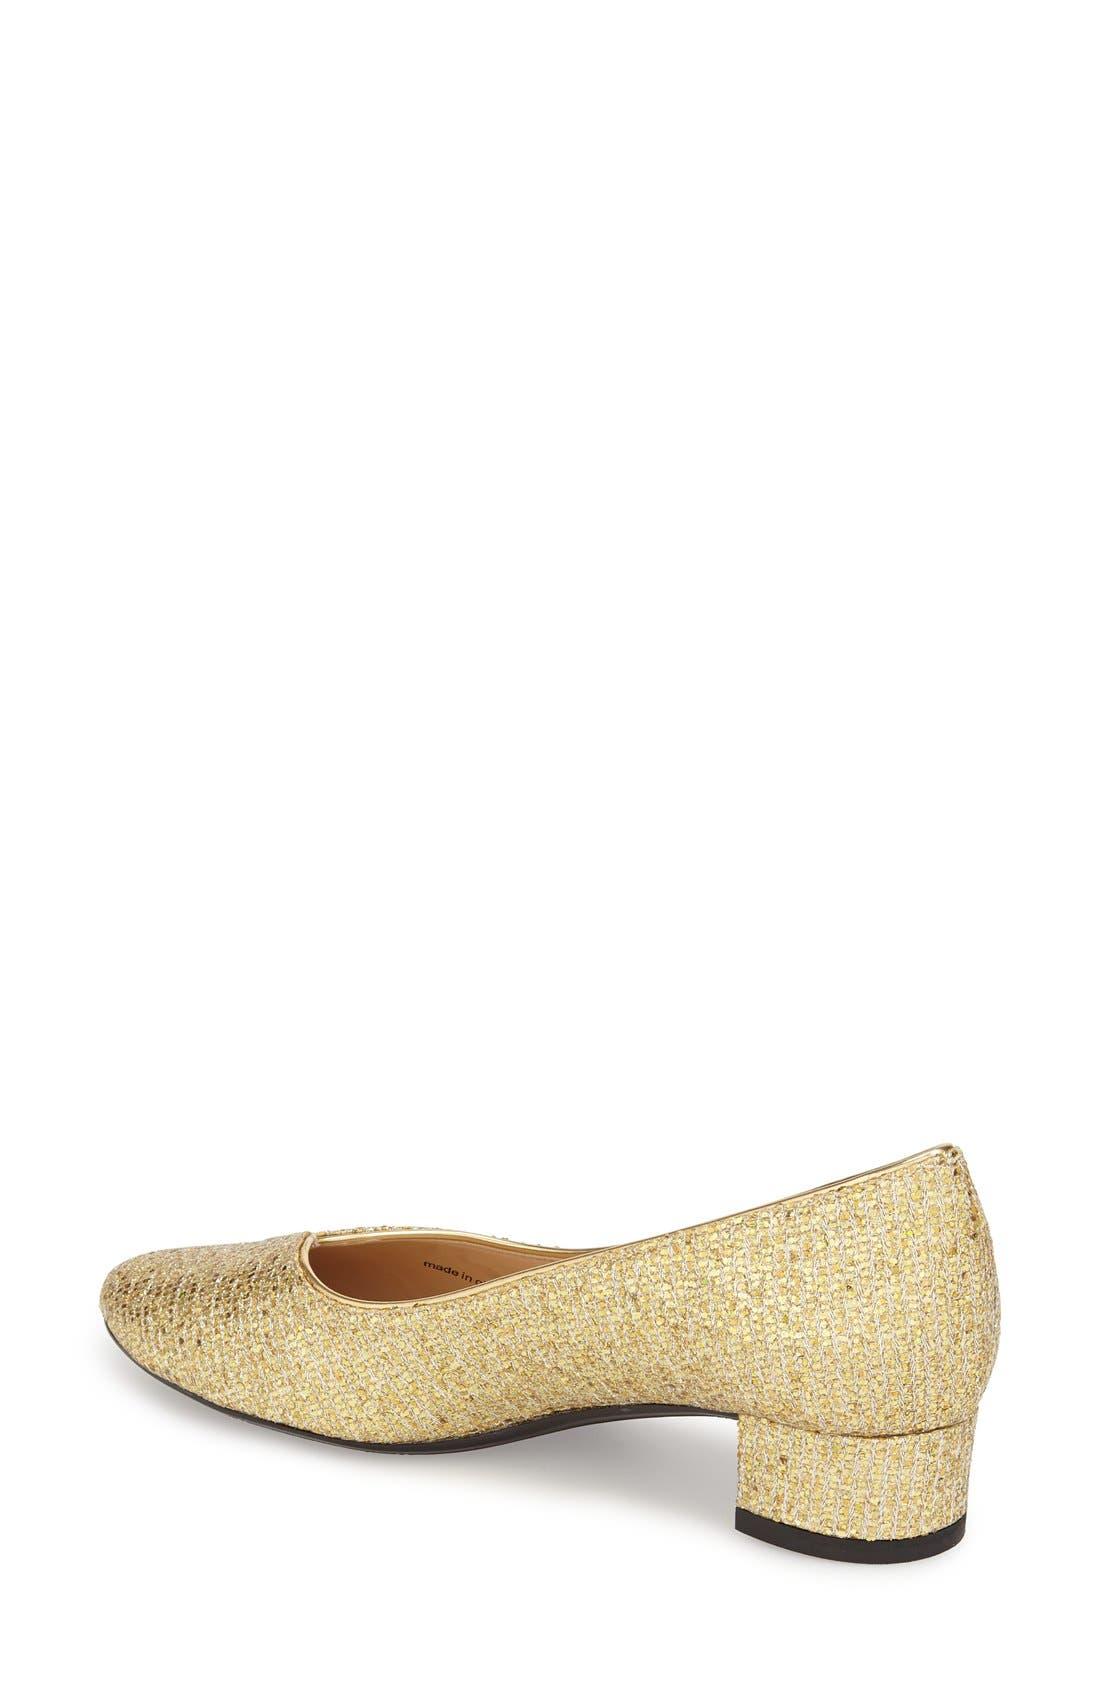 'Bambalina' Block Heel Glitter Pump,                             Alternate thumbnail 2, color,                             Gold Glitter Fabric